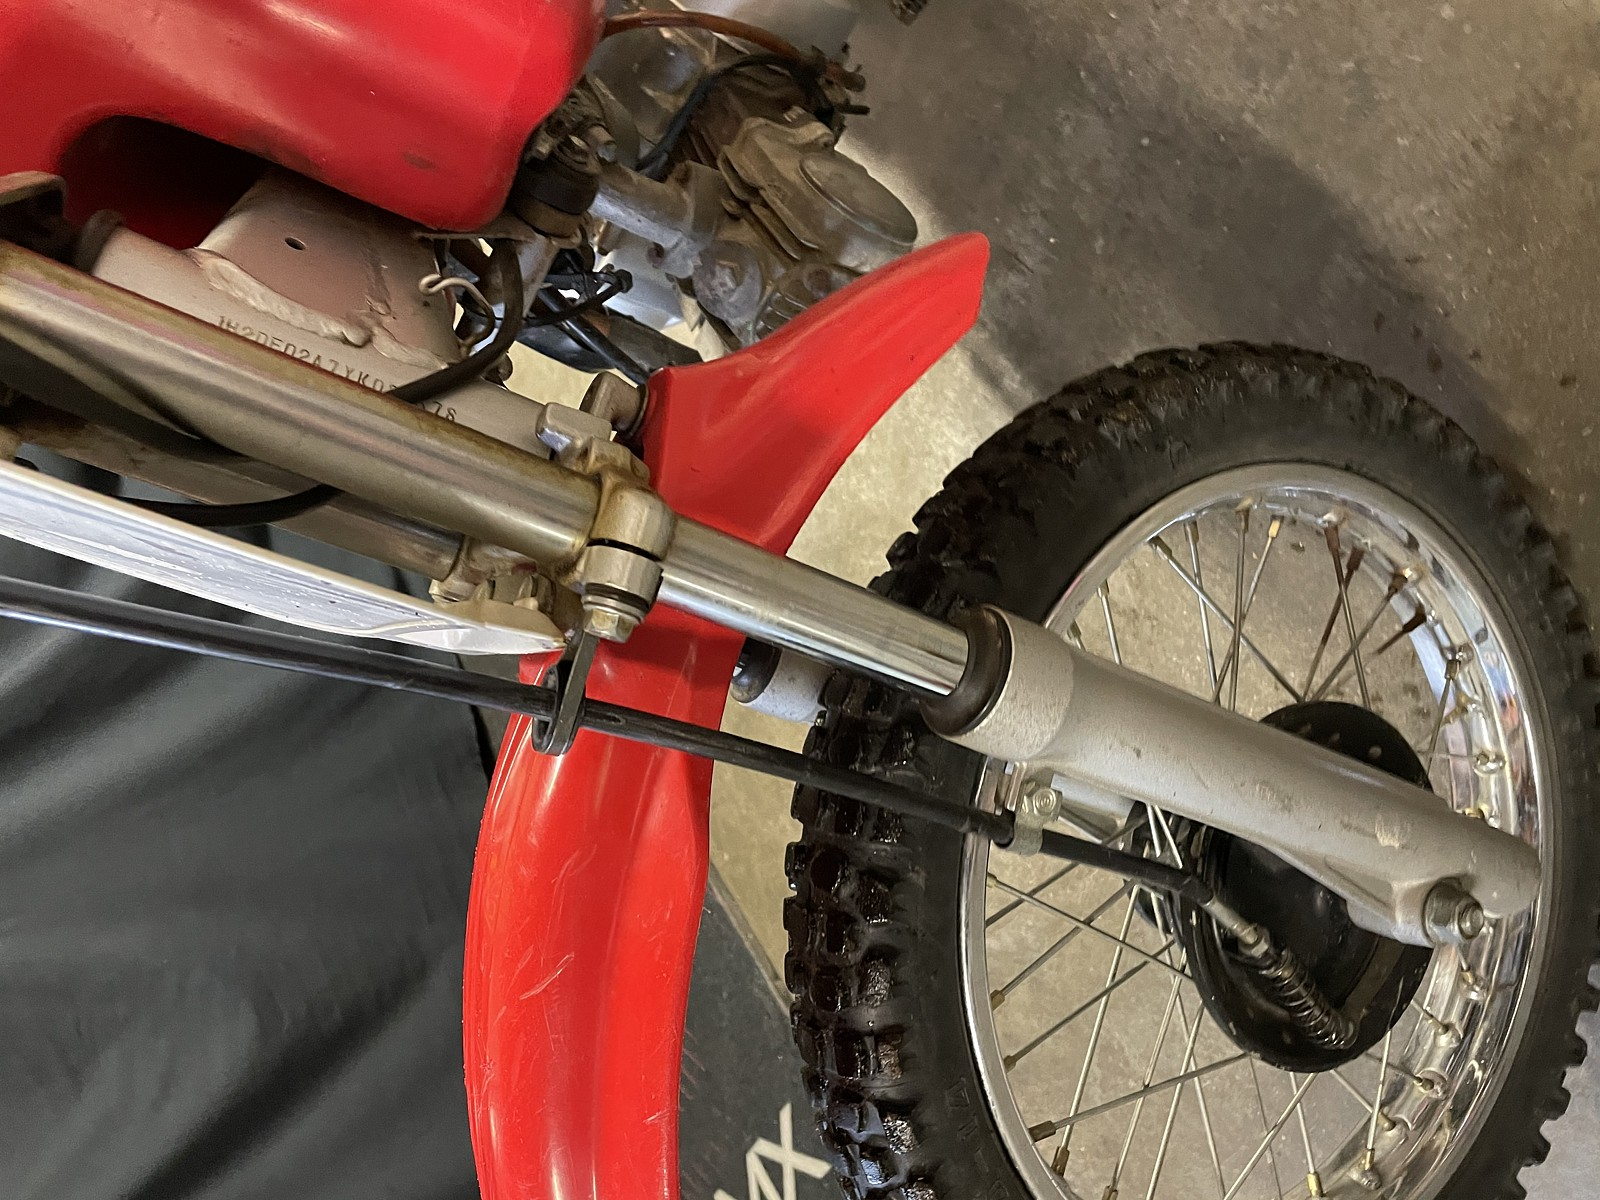 598C392D-C495-4179-BB4B-52D56A7B1722 - Godcho - Motocross Pictures - Vital MX